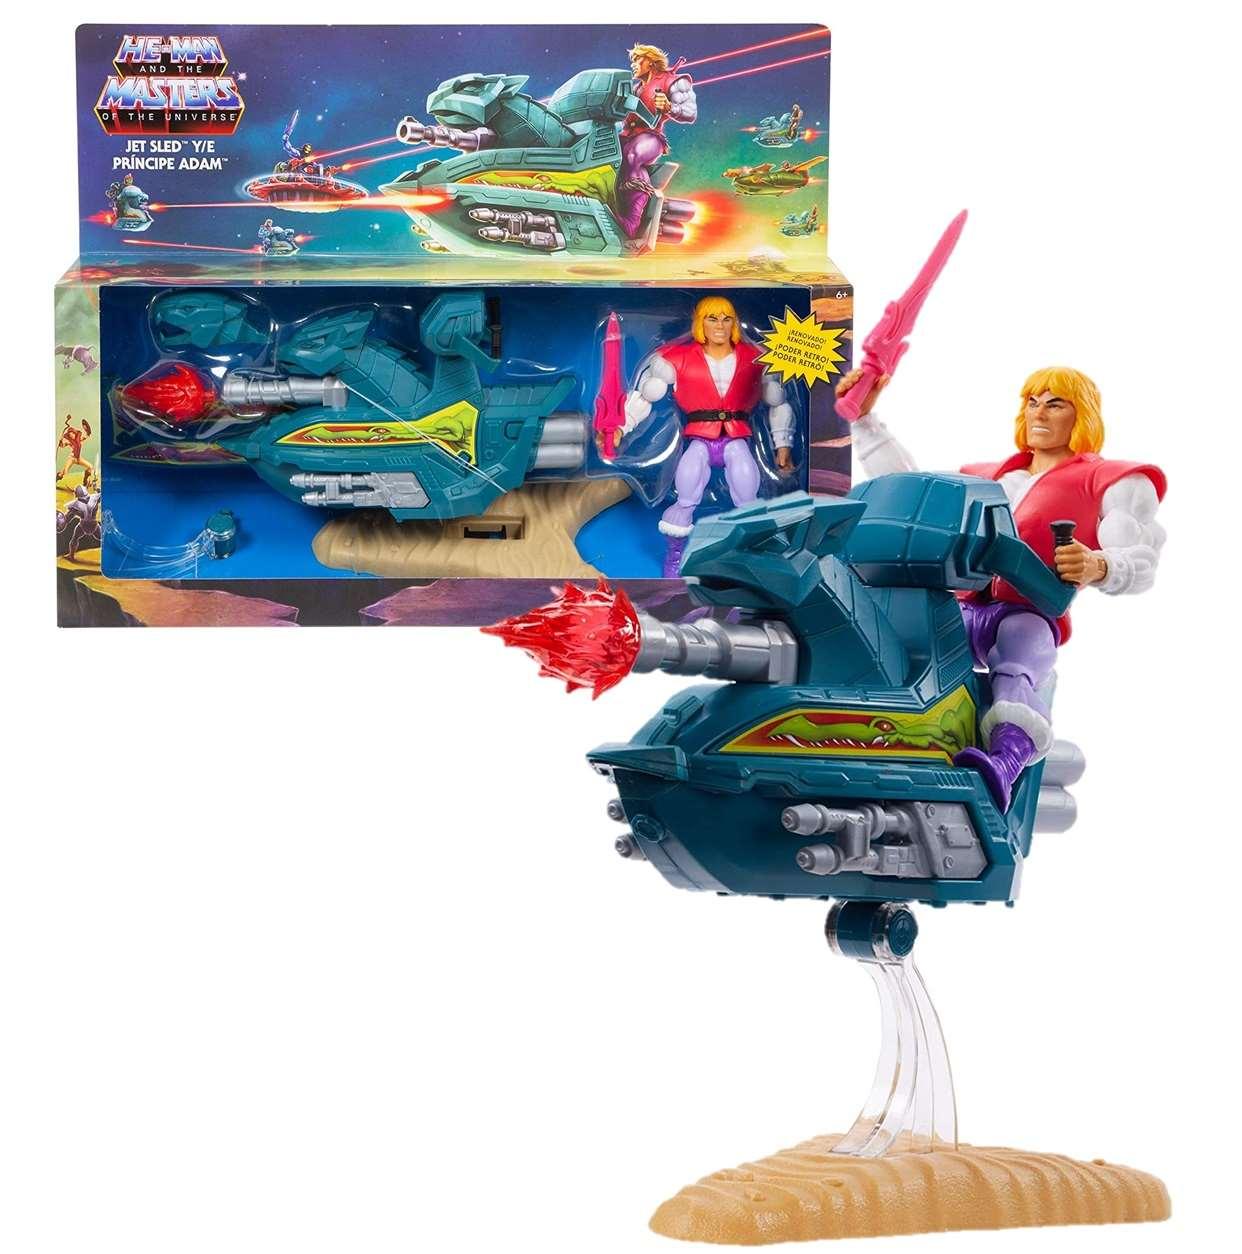 Jet Sled Principe Adam Figura Masters Of The Universe 6 PuLG